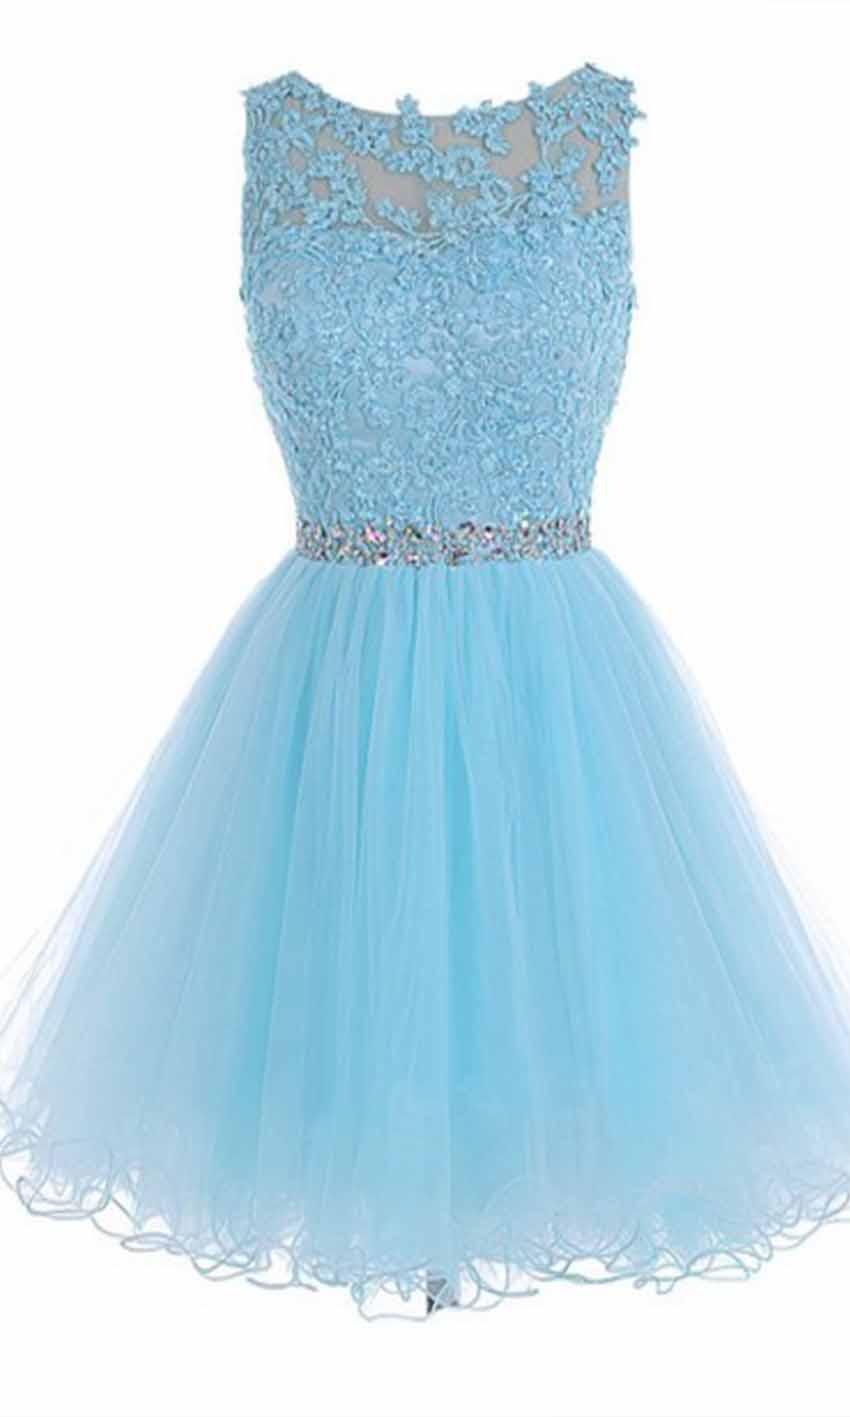 Sky Blue High Illusion Short Lace Prom Dresses KSP455 [KSP455 ...